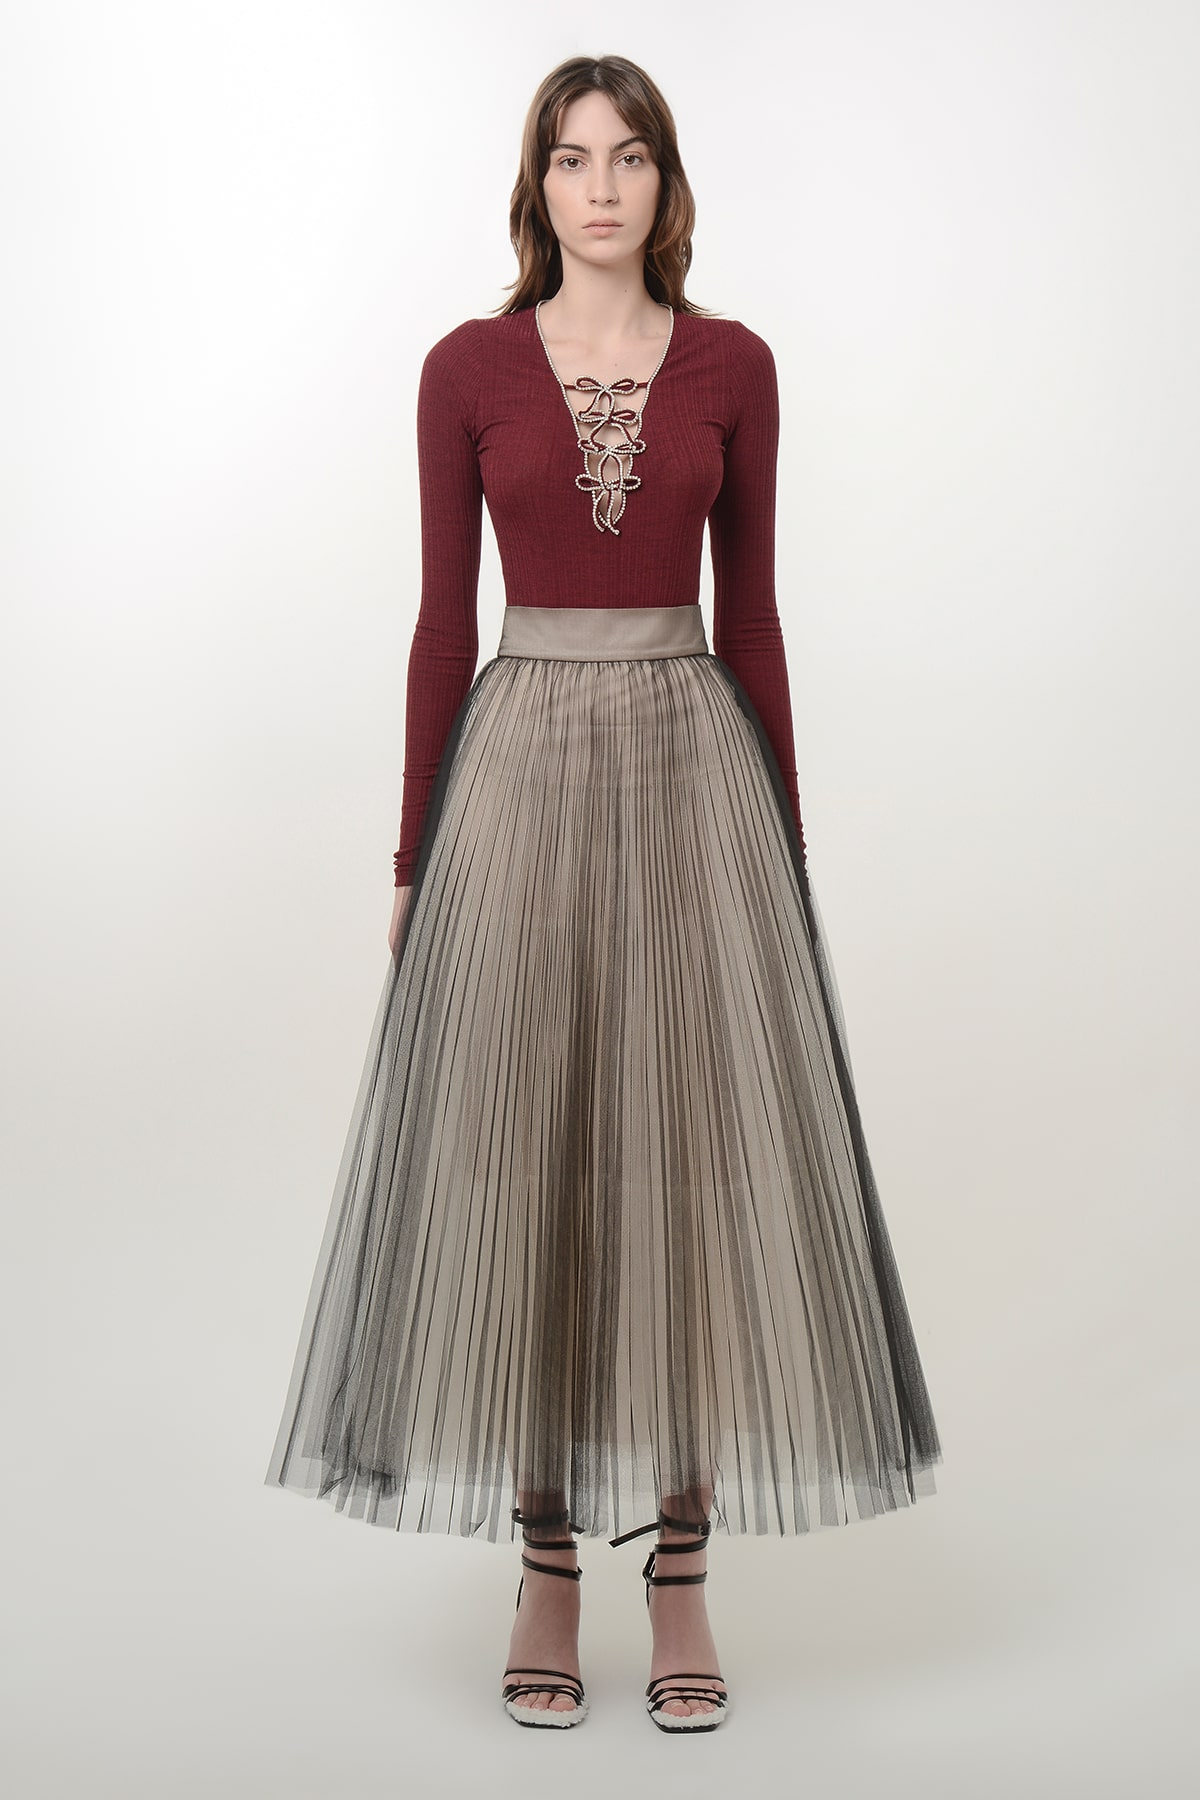 Pleated black and beige ballerina skirt 1